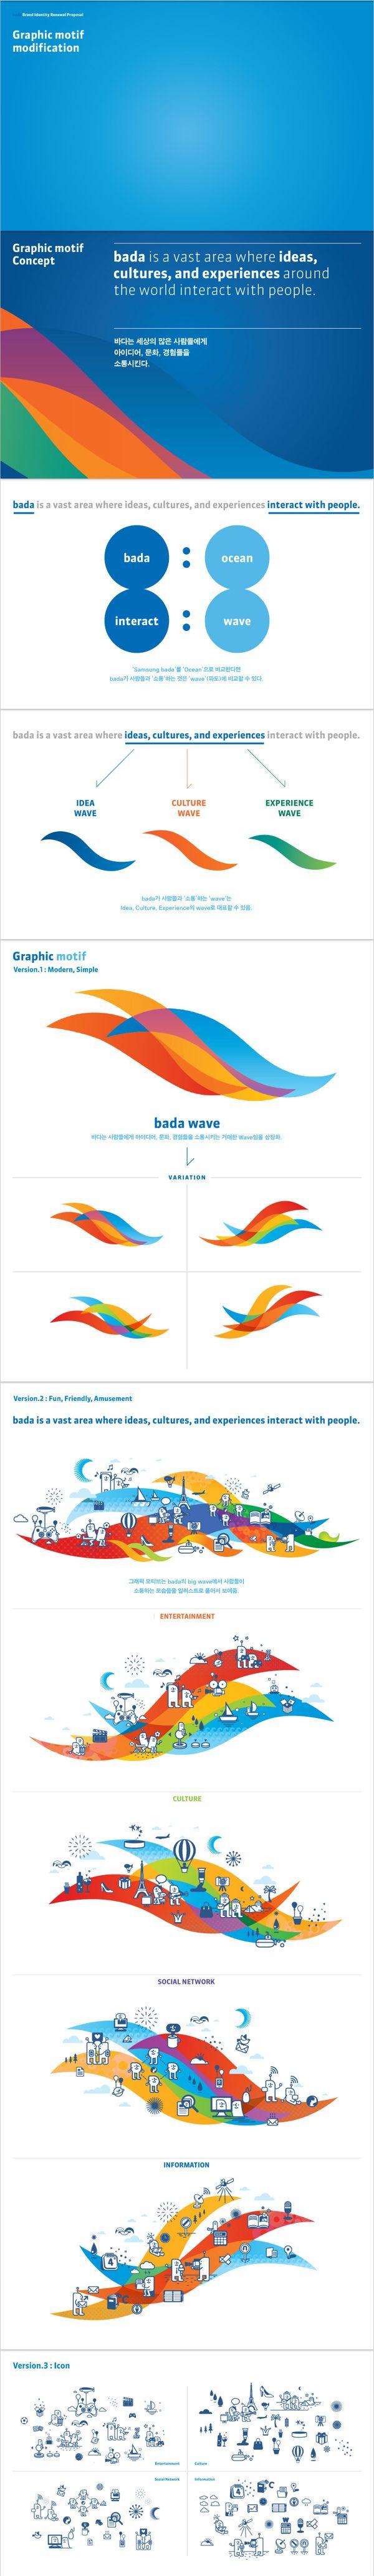 Samsung bada Brand eXperience identity renewal by Plus X , via Behance